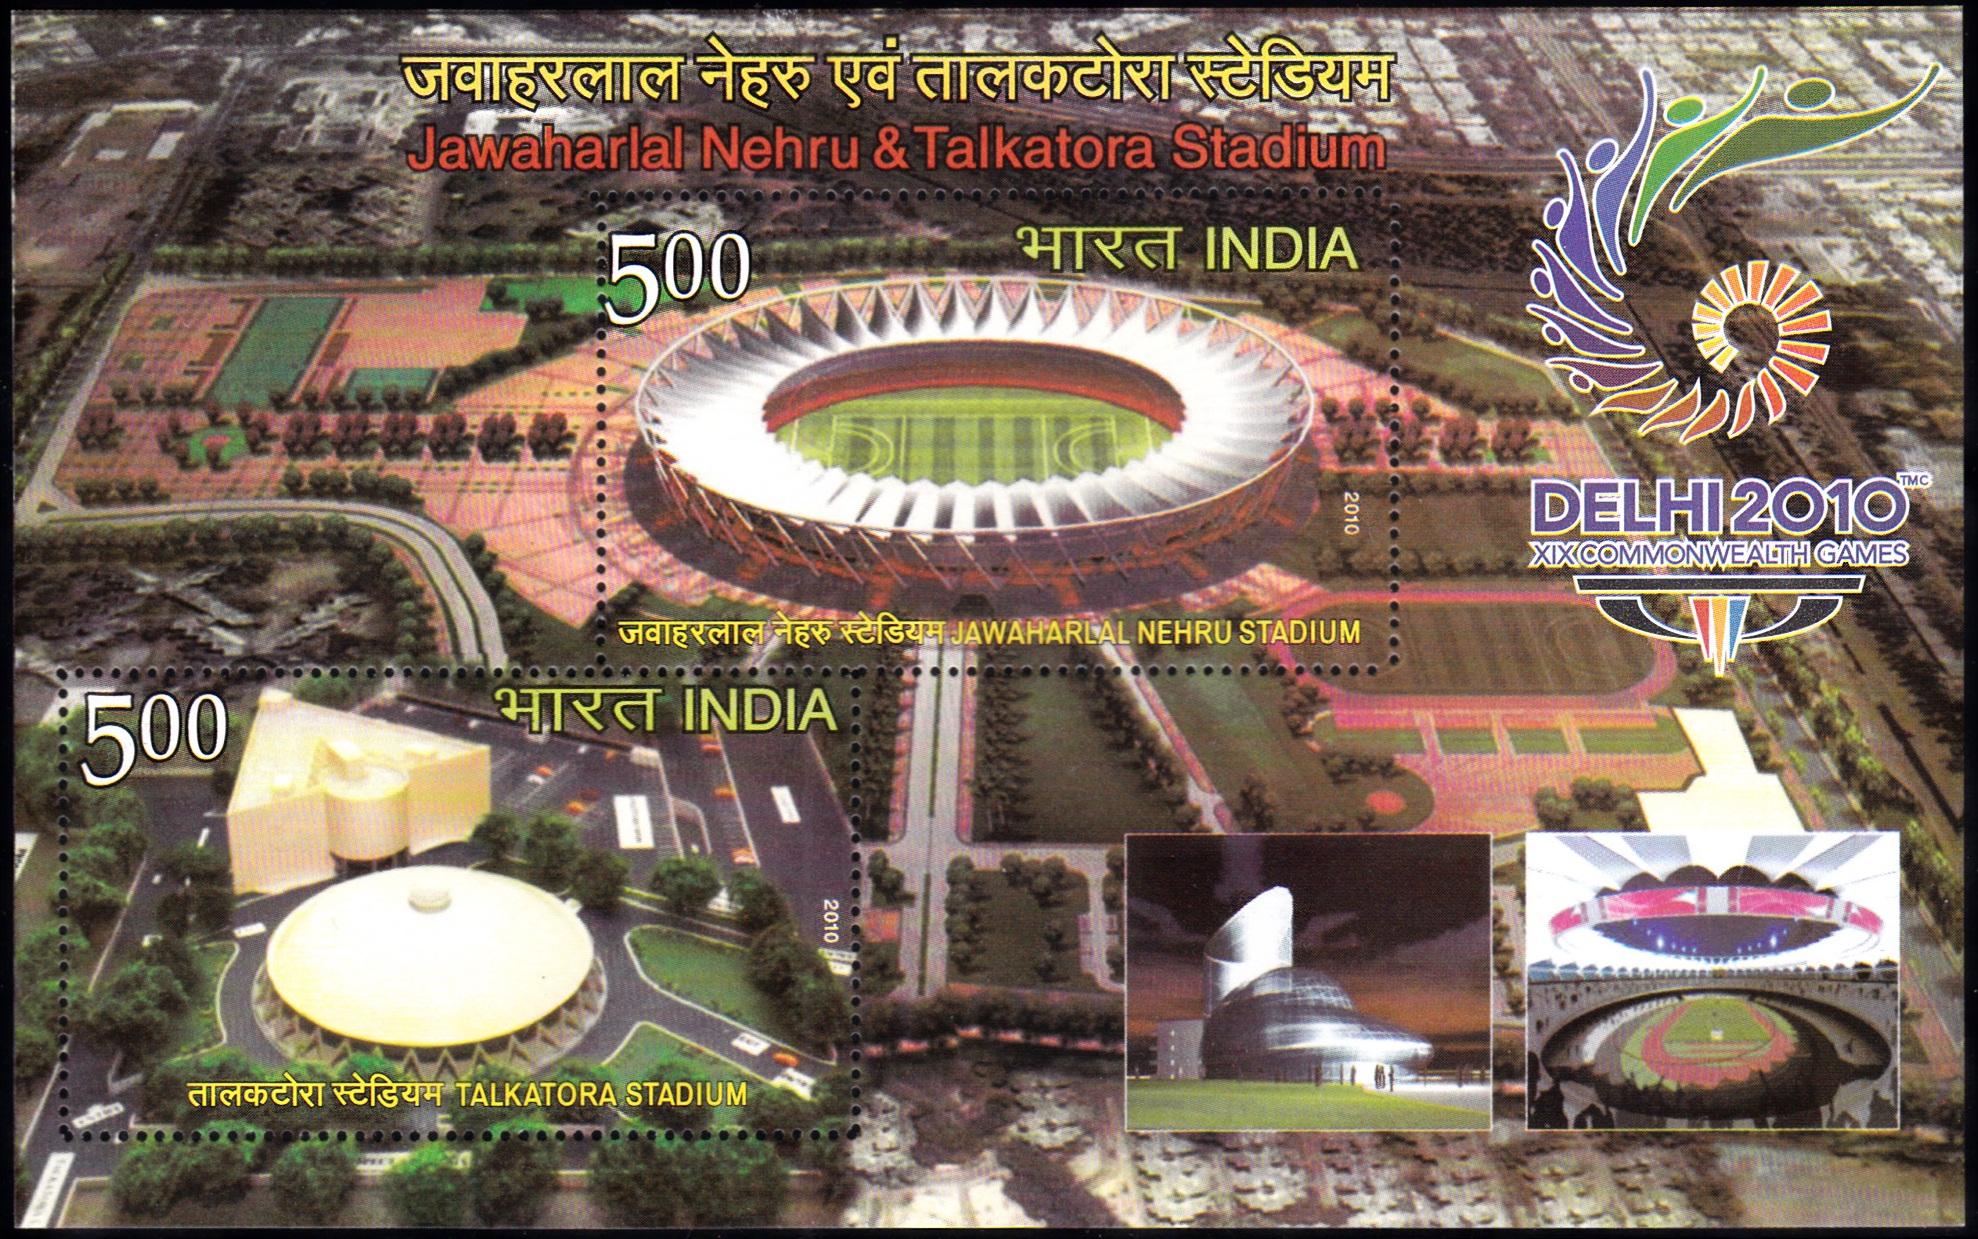 2010 Commonwealth Games : Multi-sport event